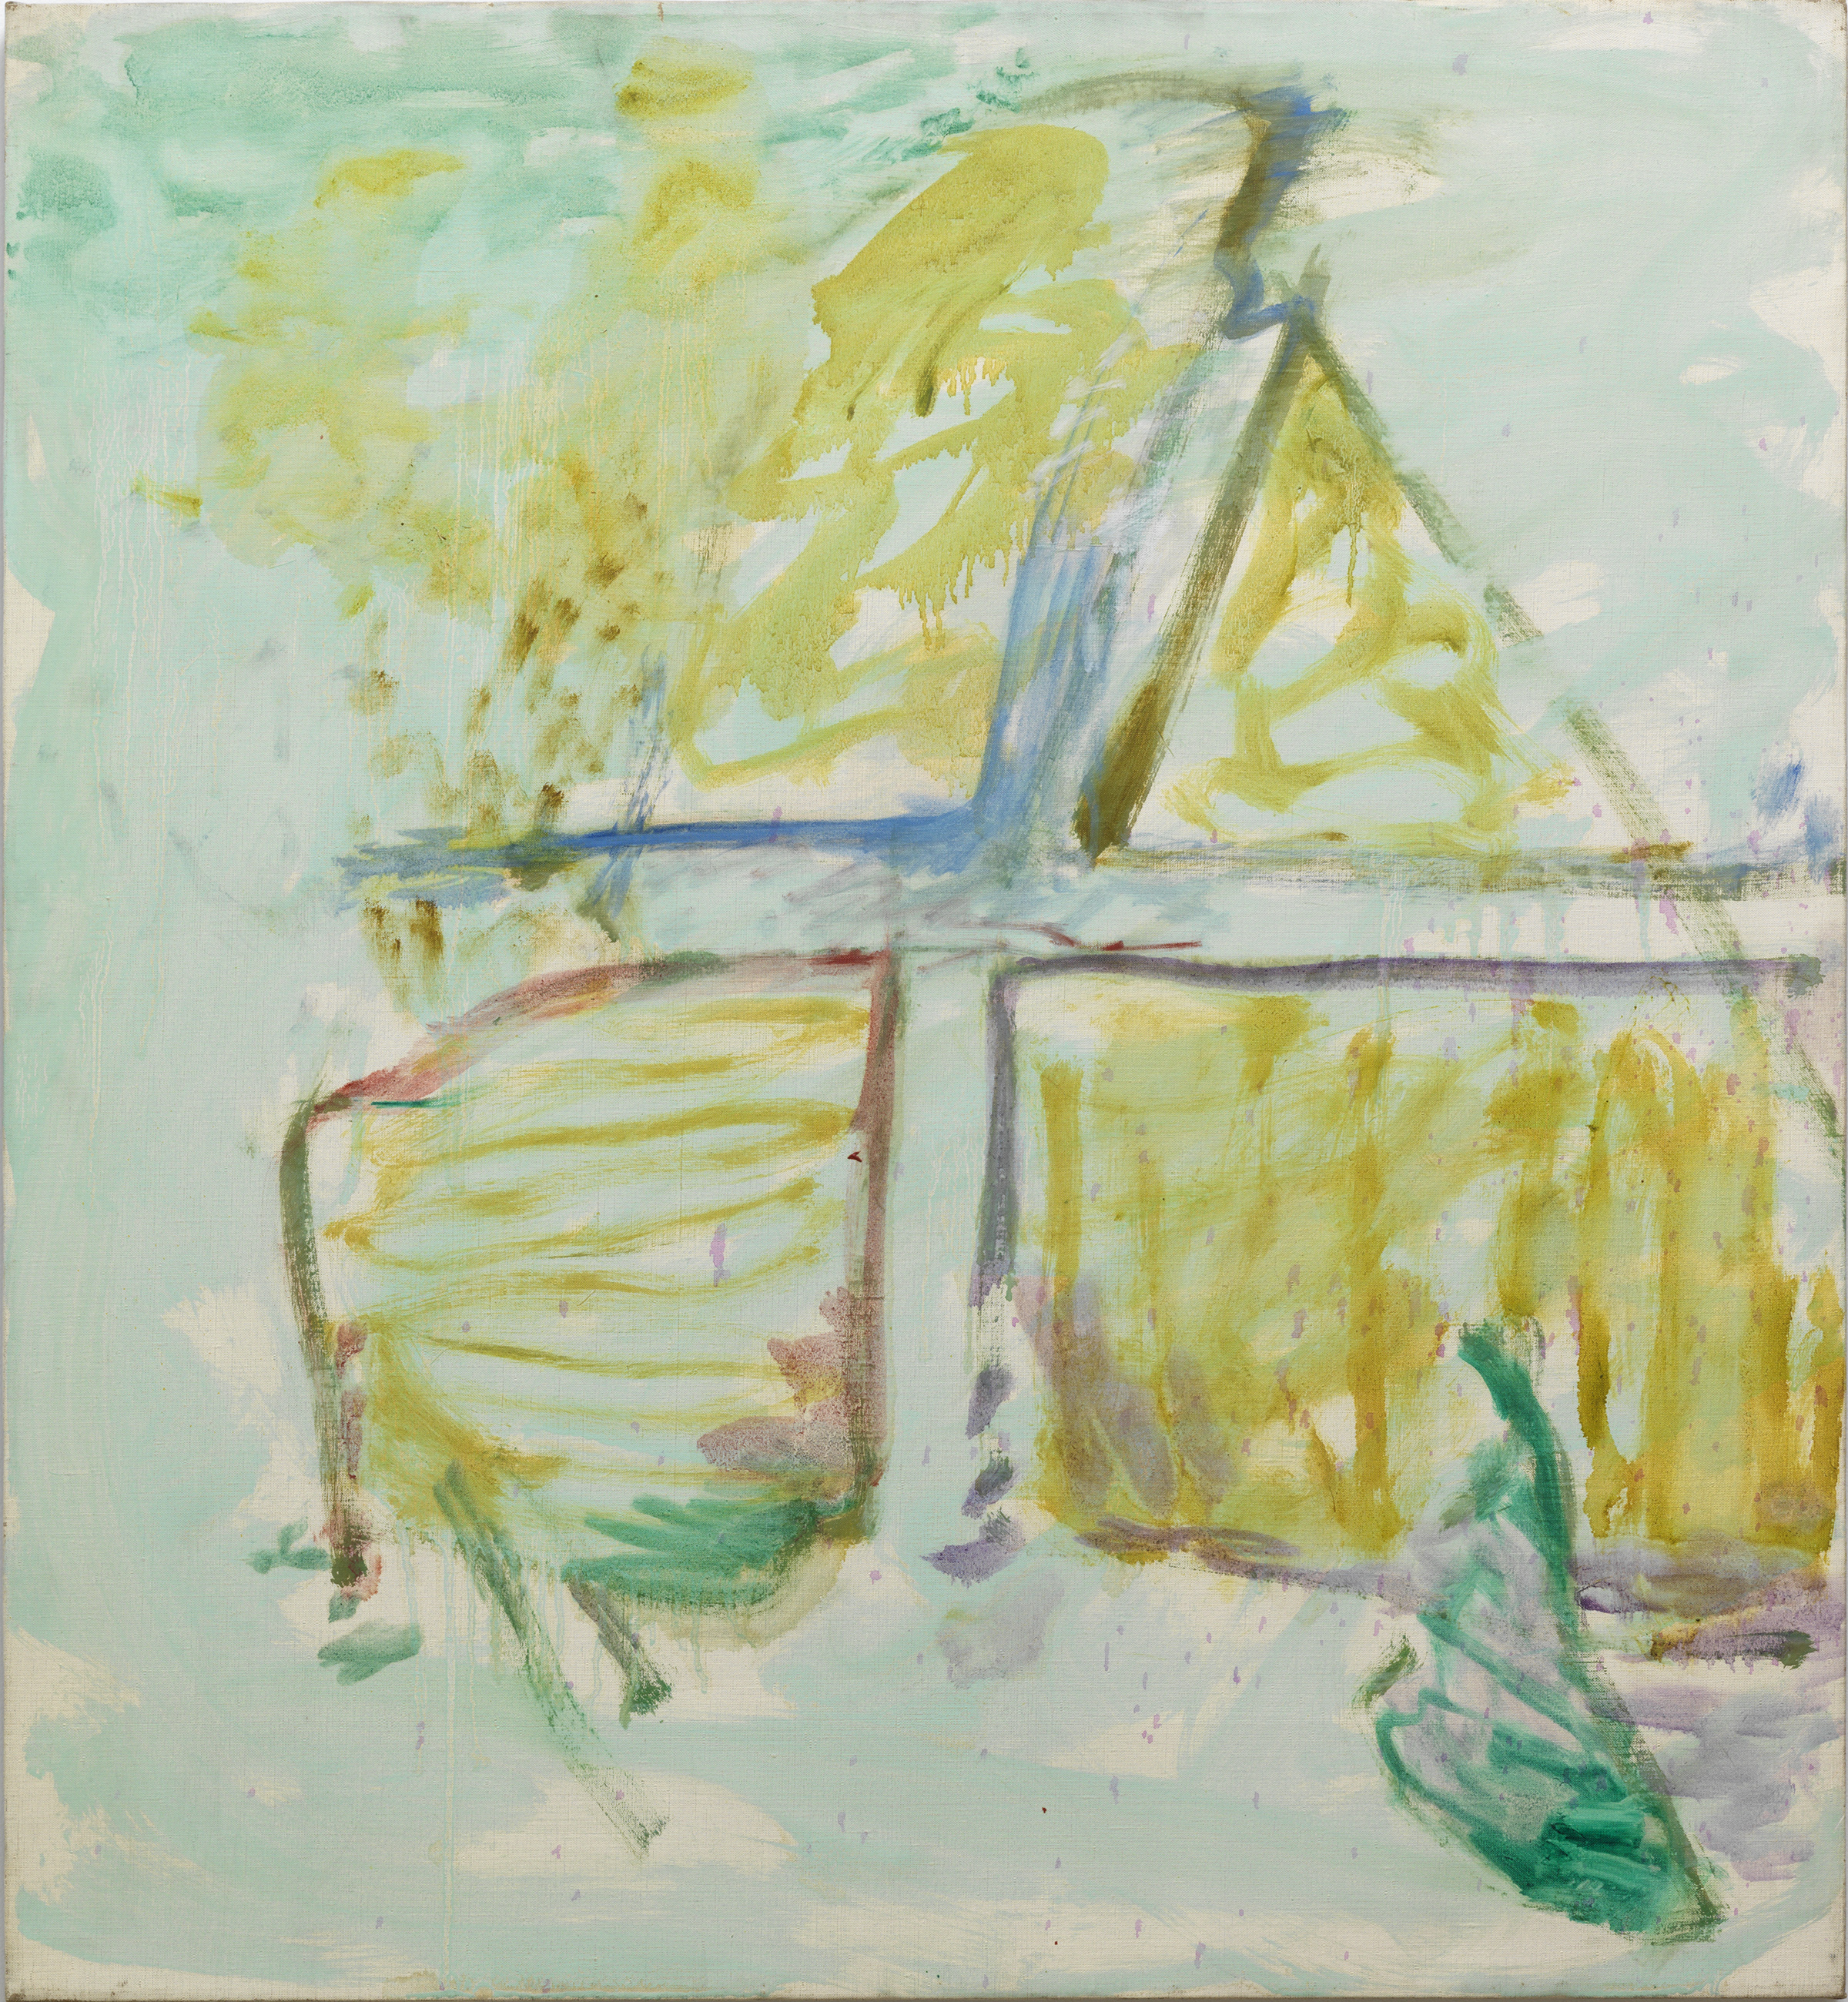 Pat Passlof  Domino , 1961 Oil on linen 28 x 26 inches